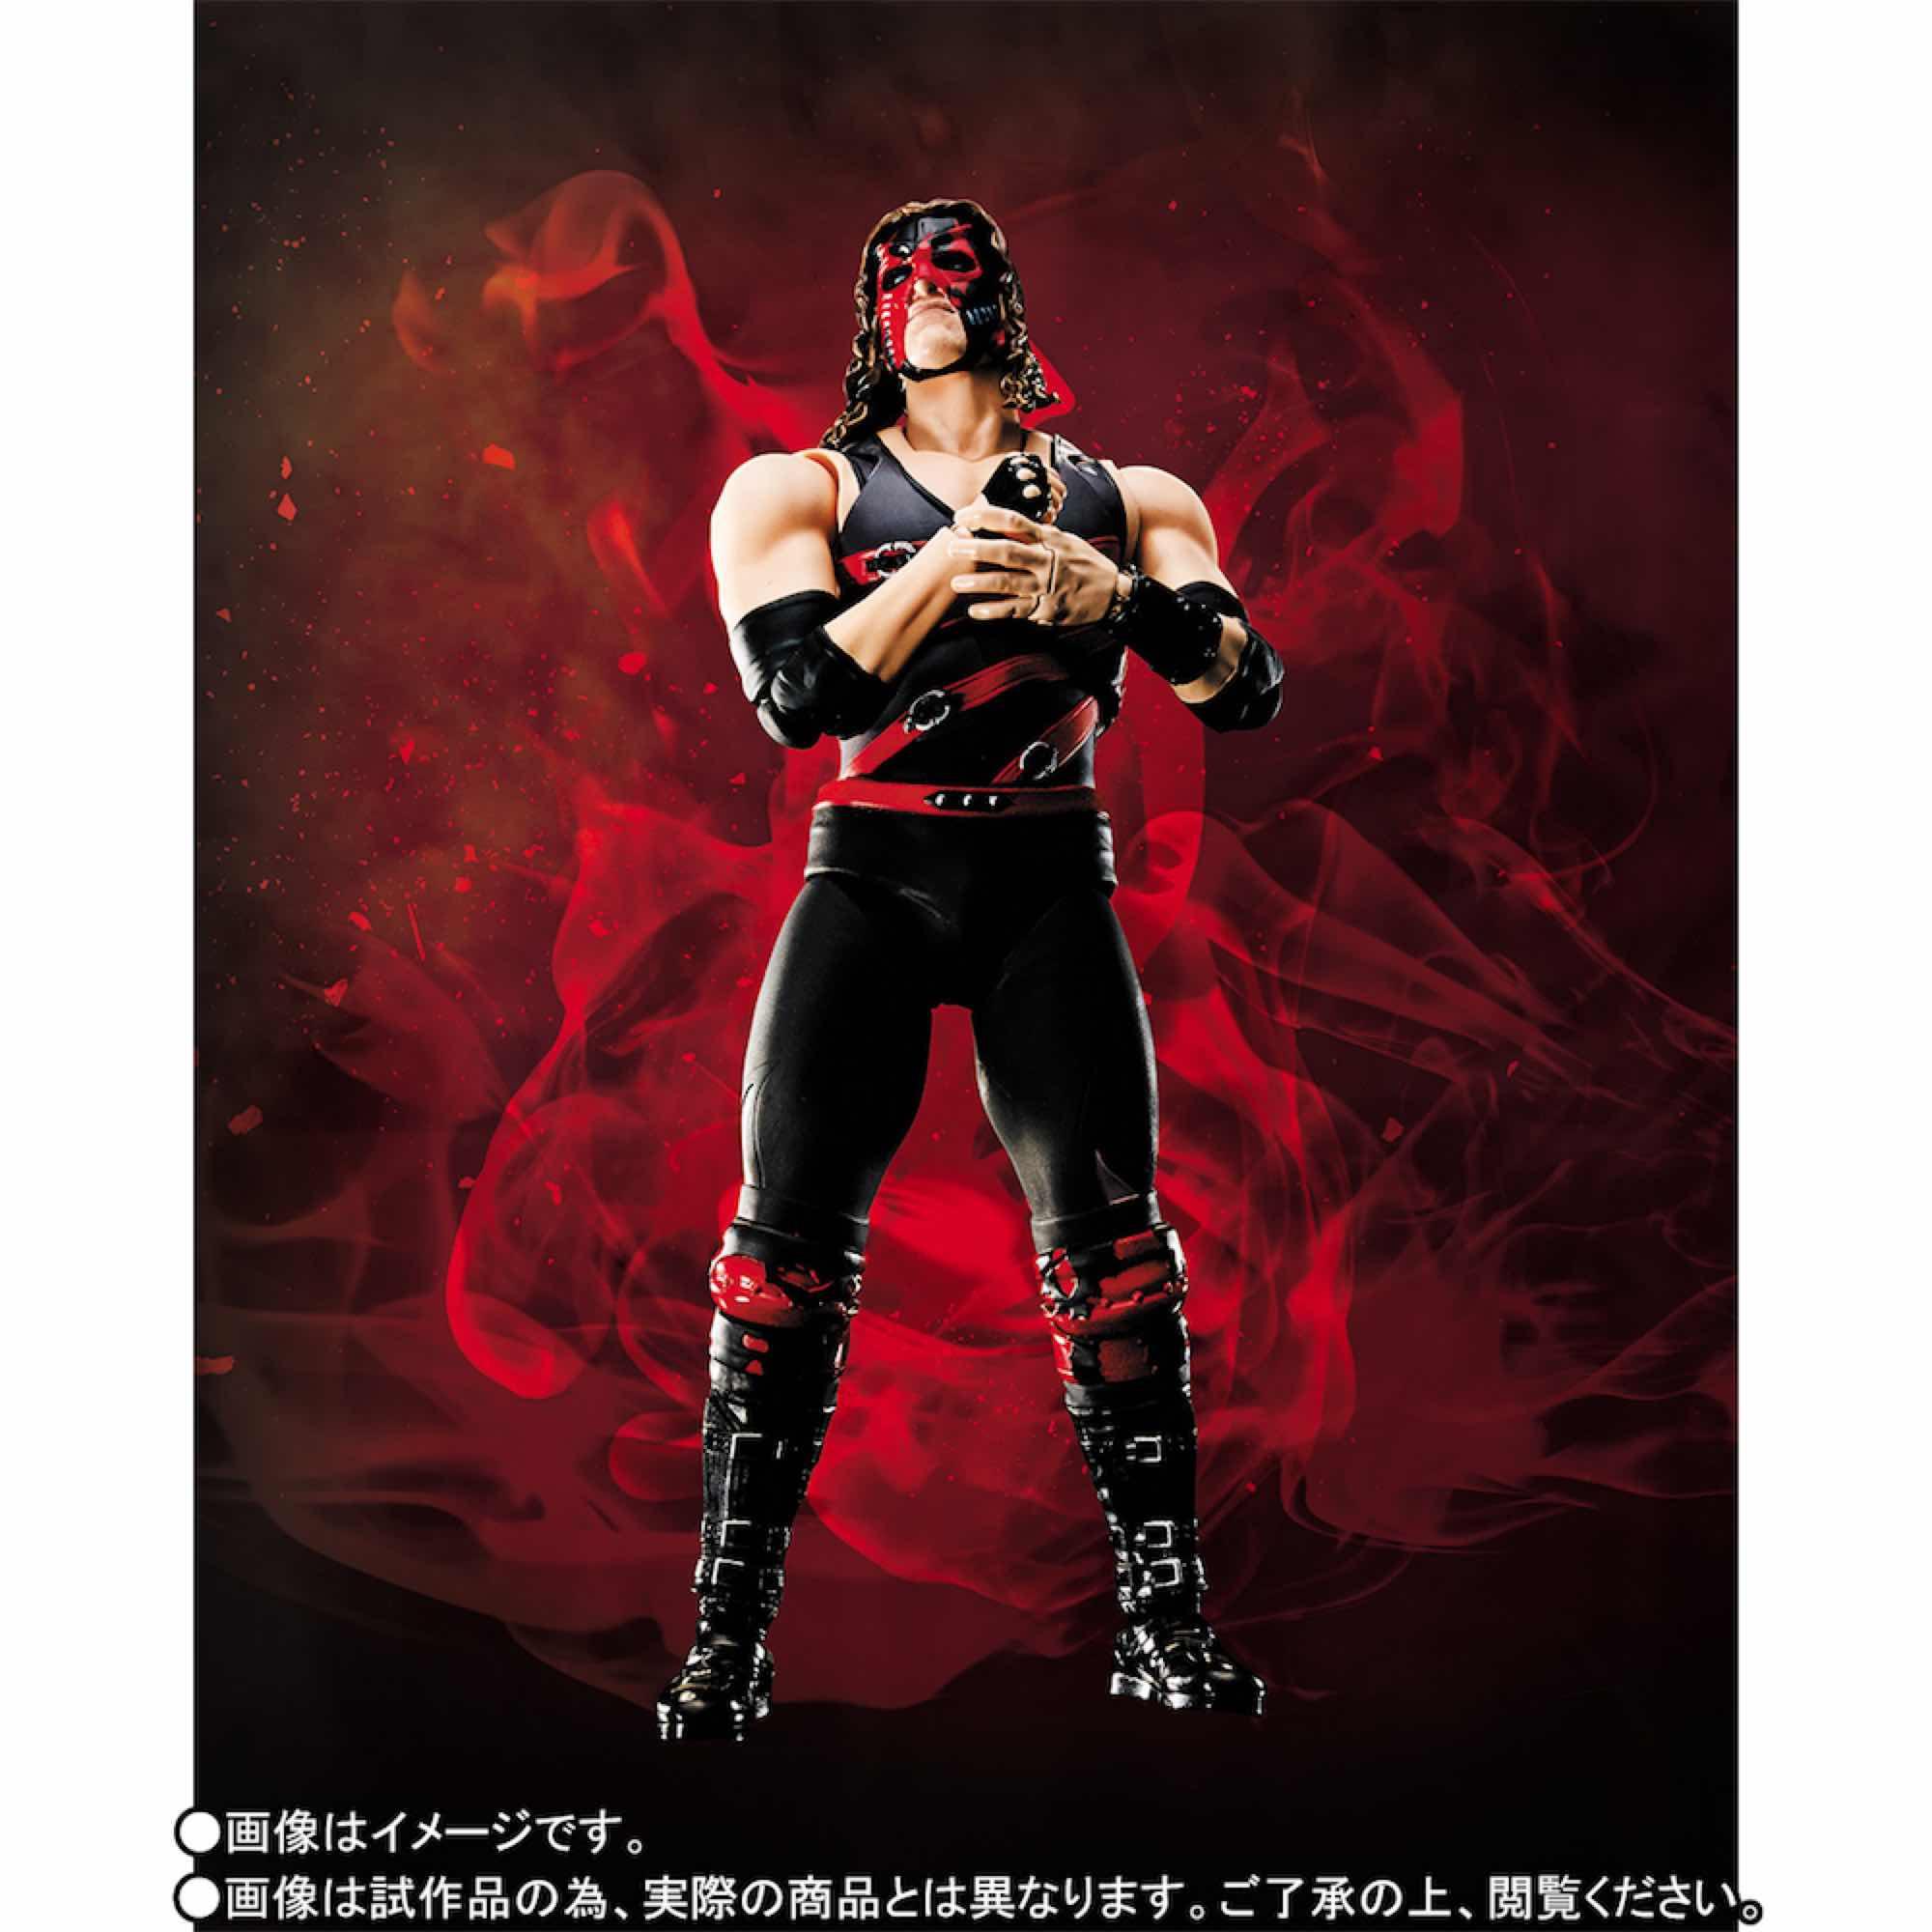 KANE FIGURA 15 CM WWE SH FIGUARTS